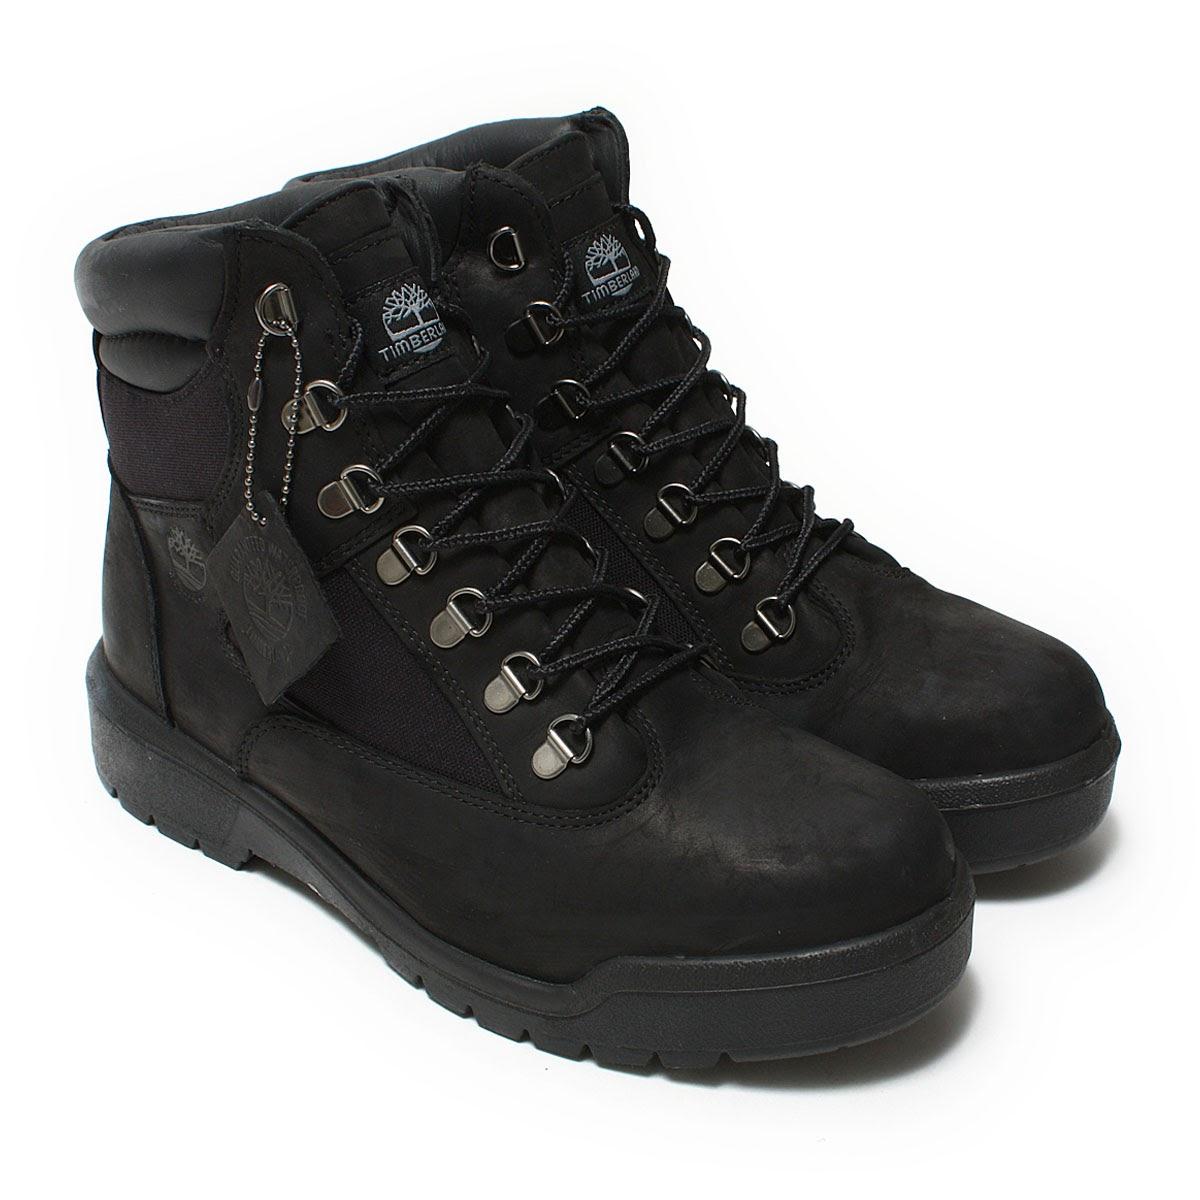 Timberland Field Boot 6